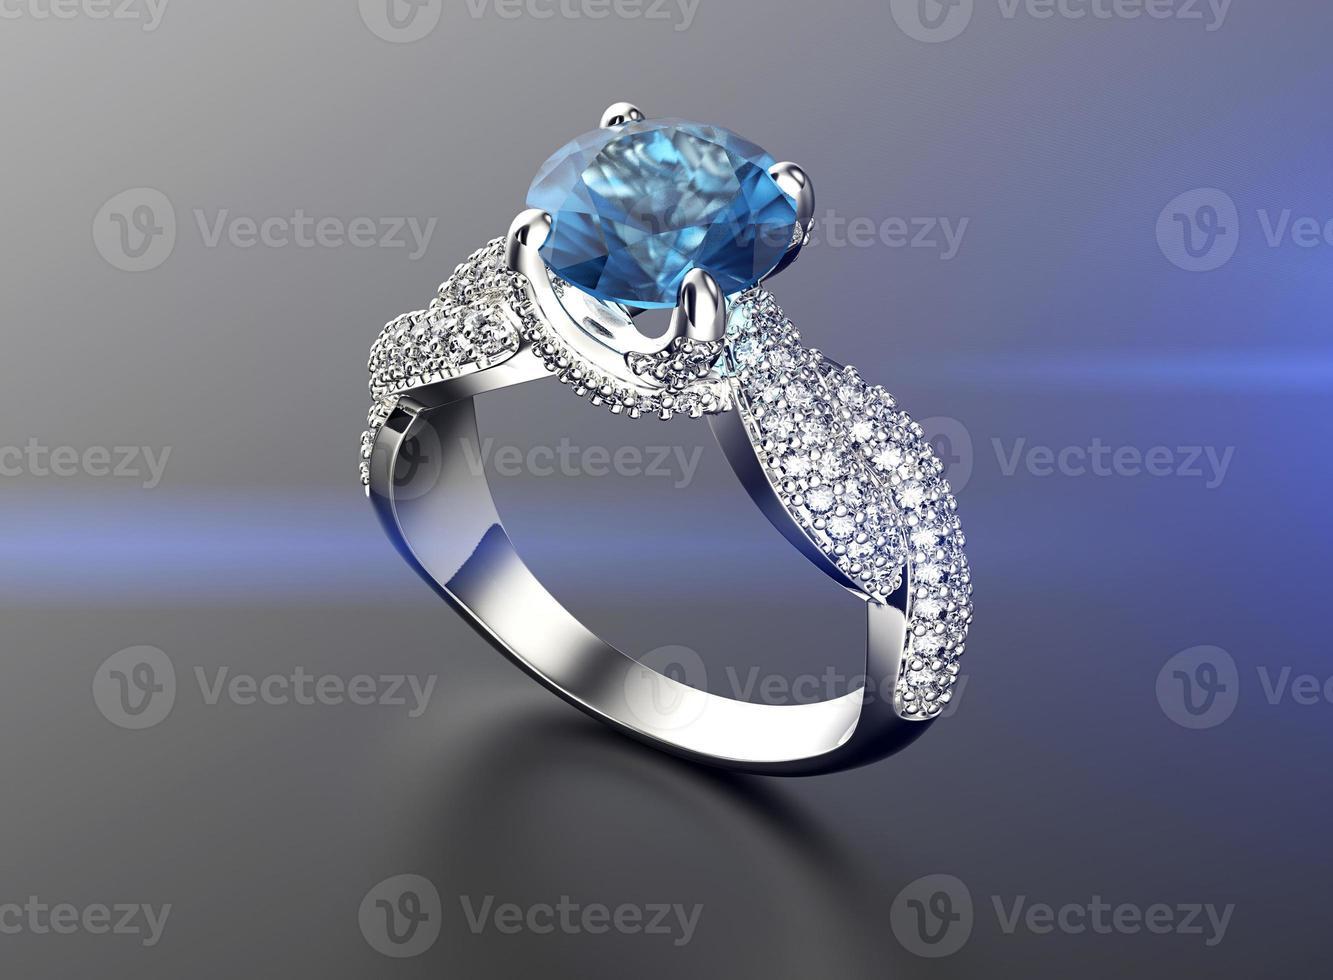 anel de noivado de ouro com diamante ou moissanite. joias backg foto